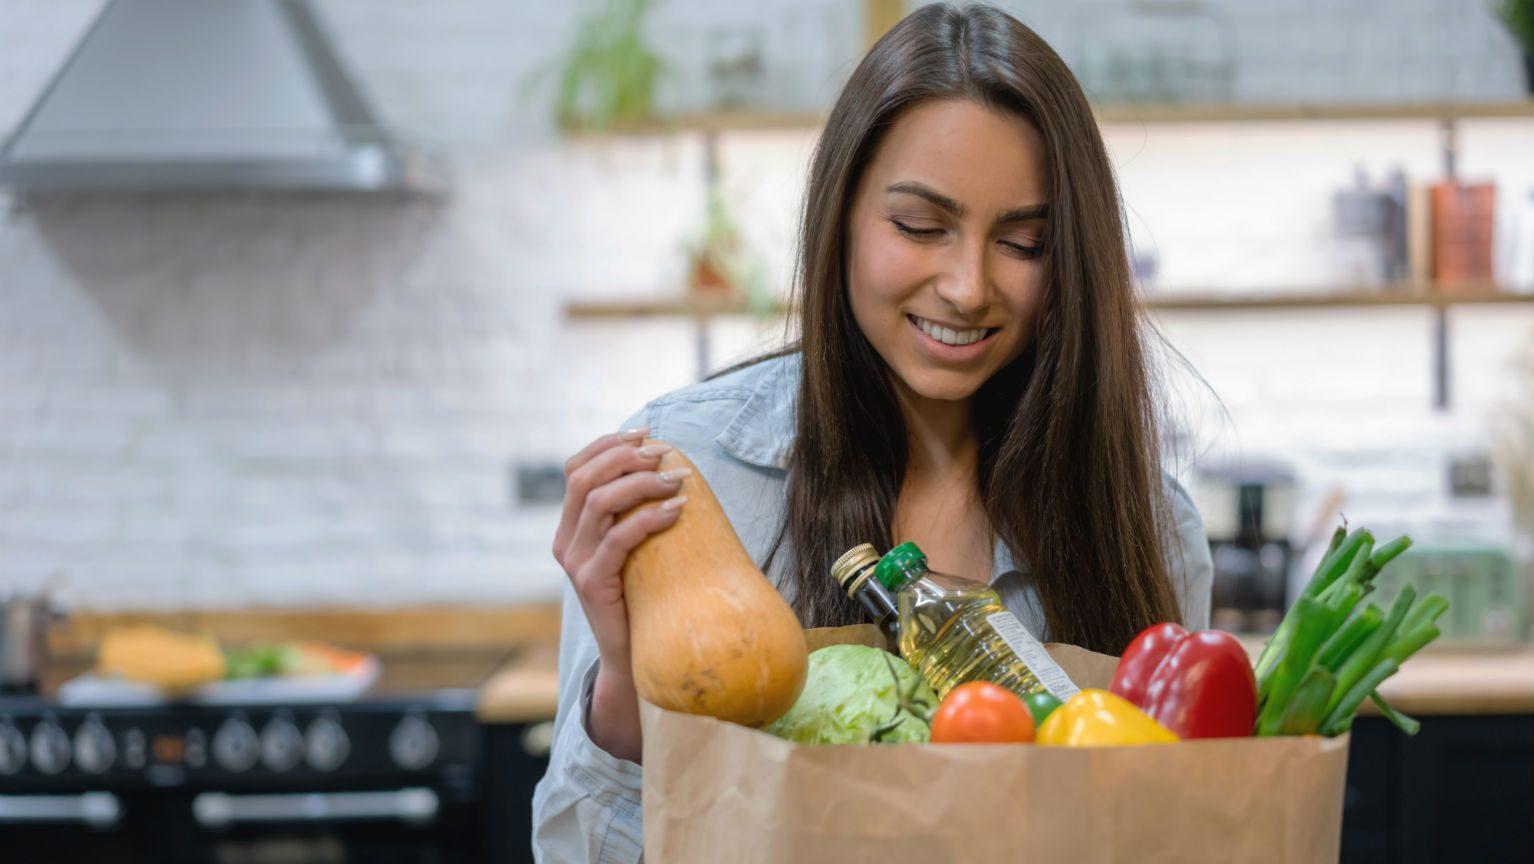 Woman unpacking grocery bag